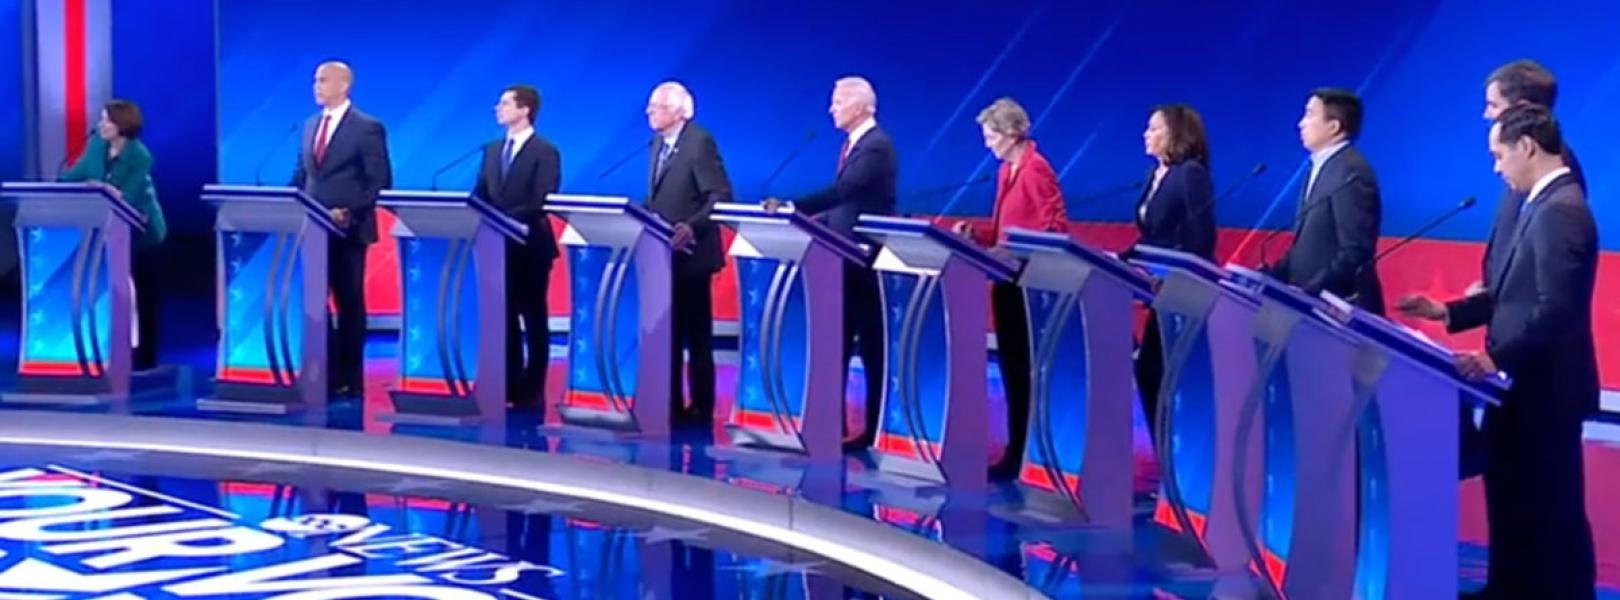 ABC dem debate